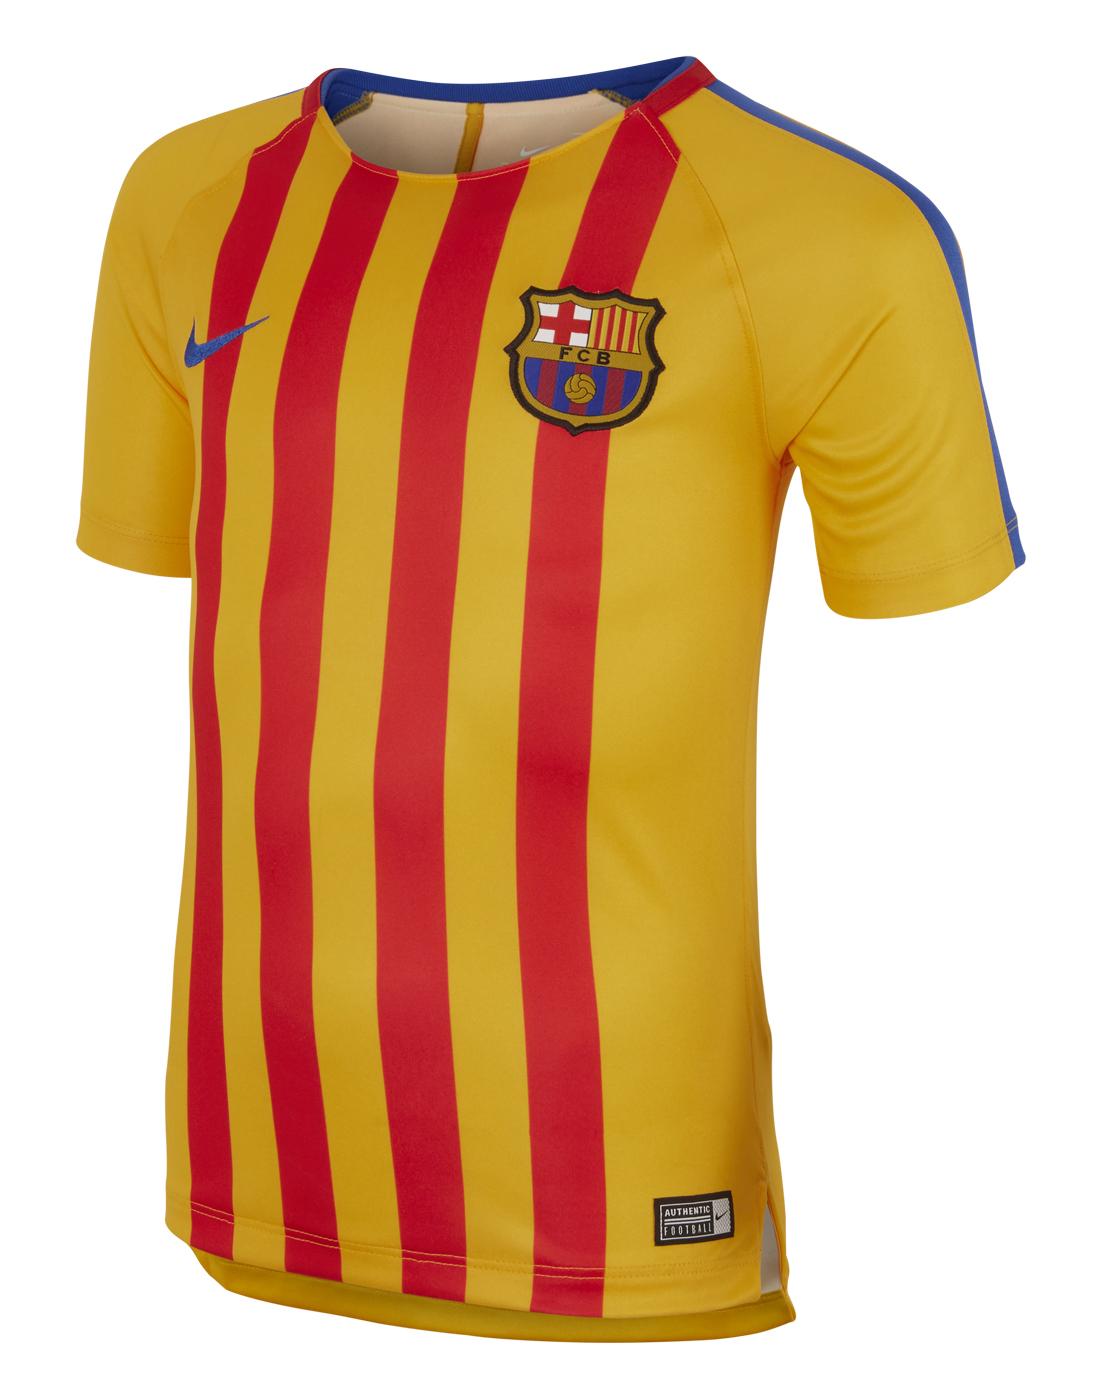 hot sale online ef7ae 77fbd barcelona yellow jersey